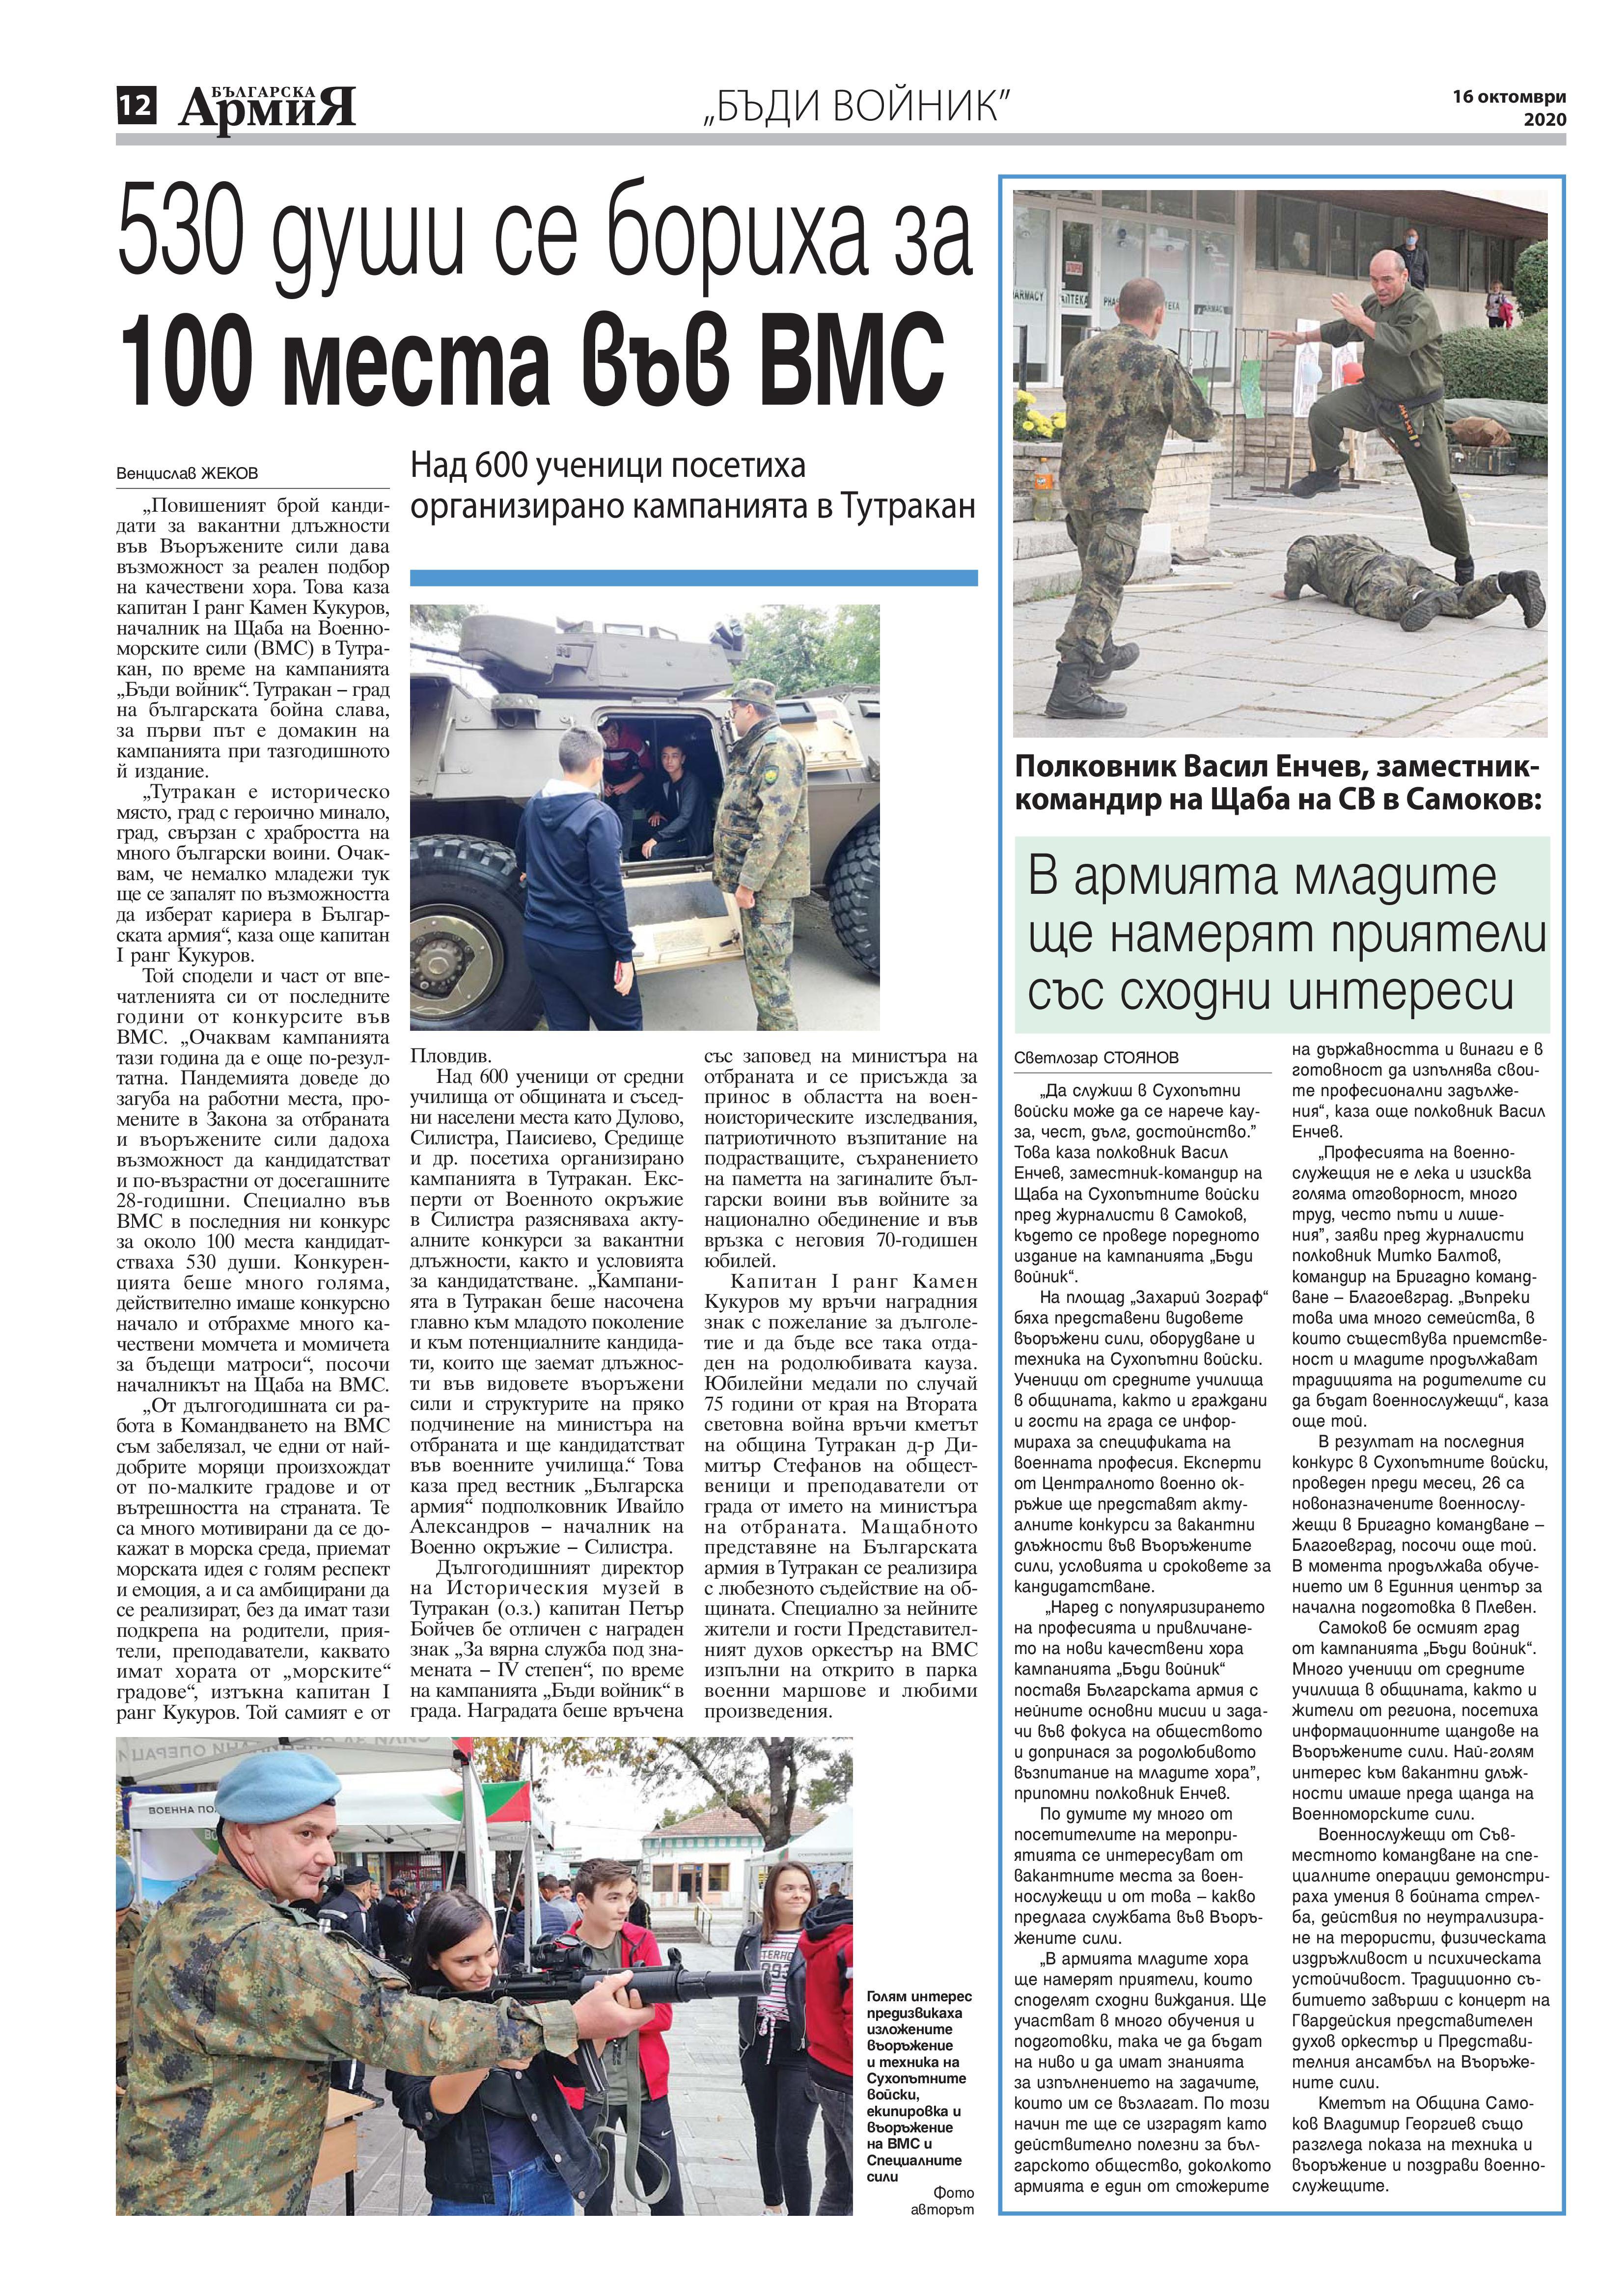 https://www.armymedia.bg/wp-content/uploads/2015/06/12-44.jpg